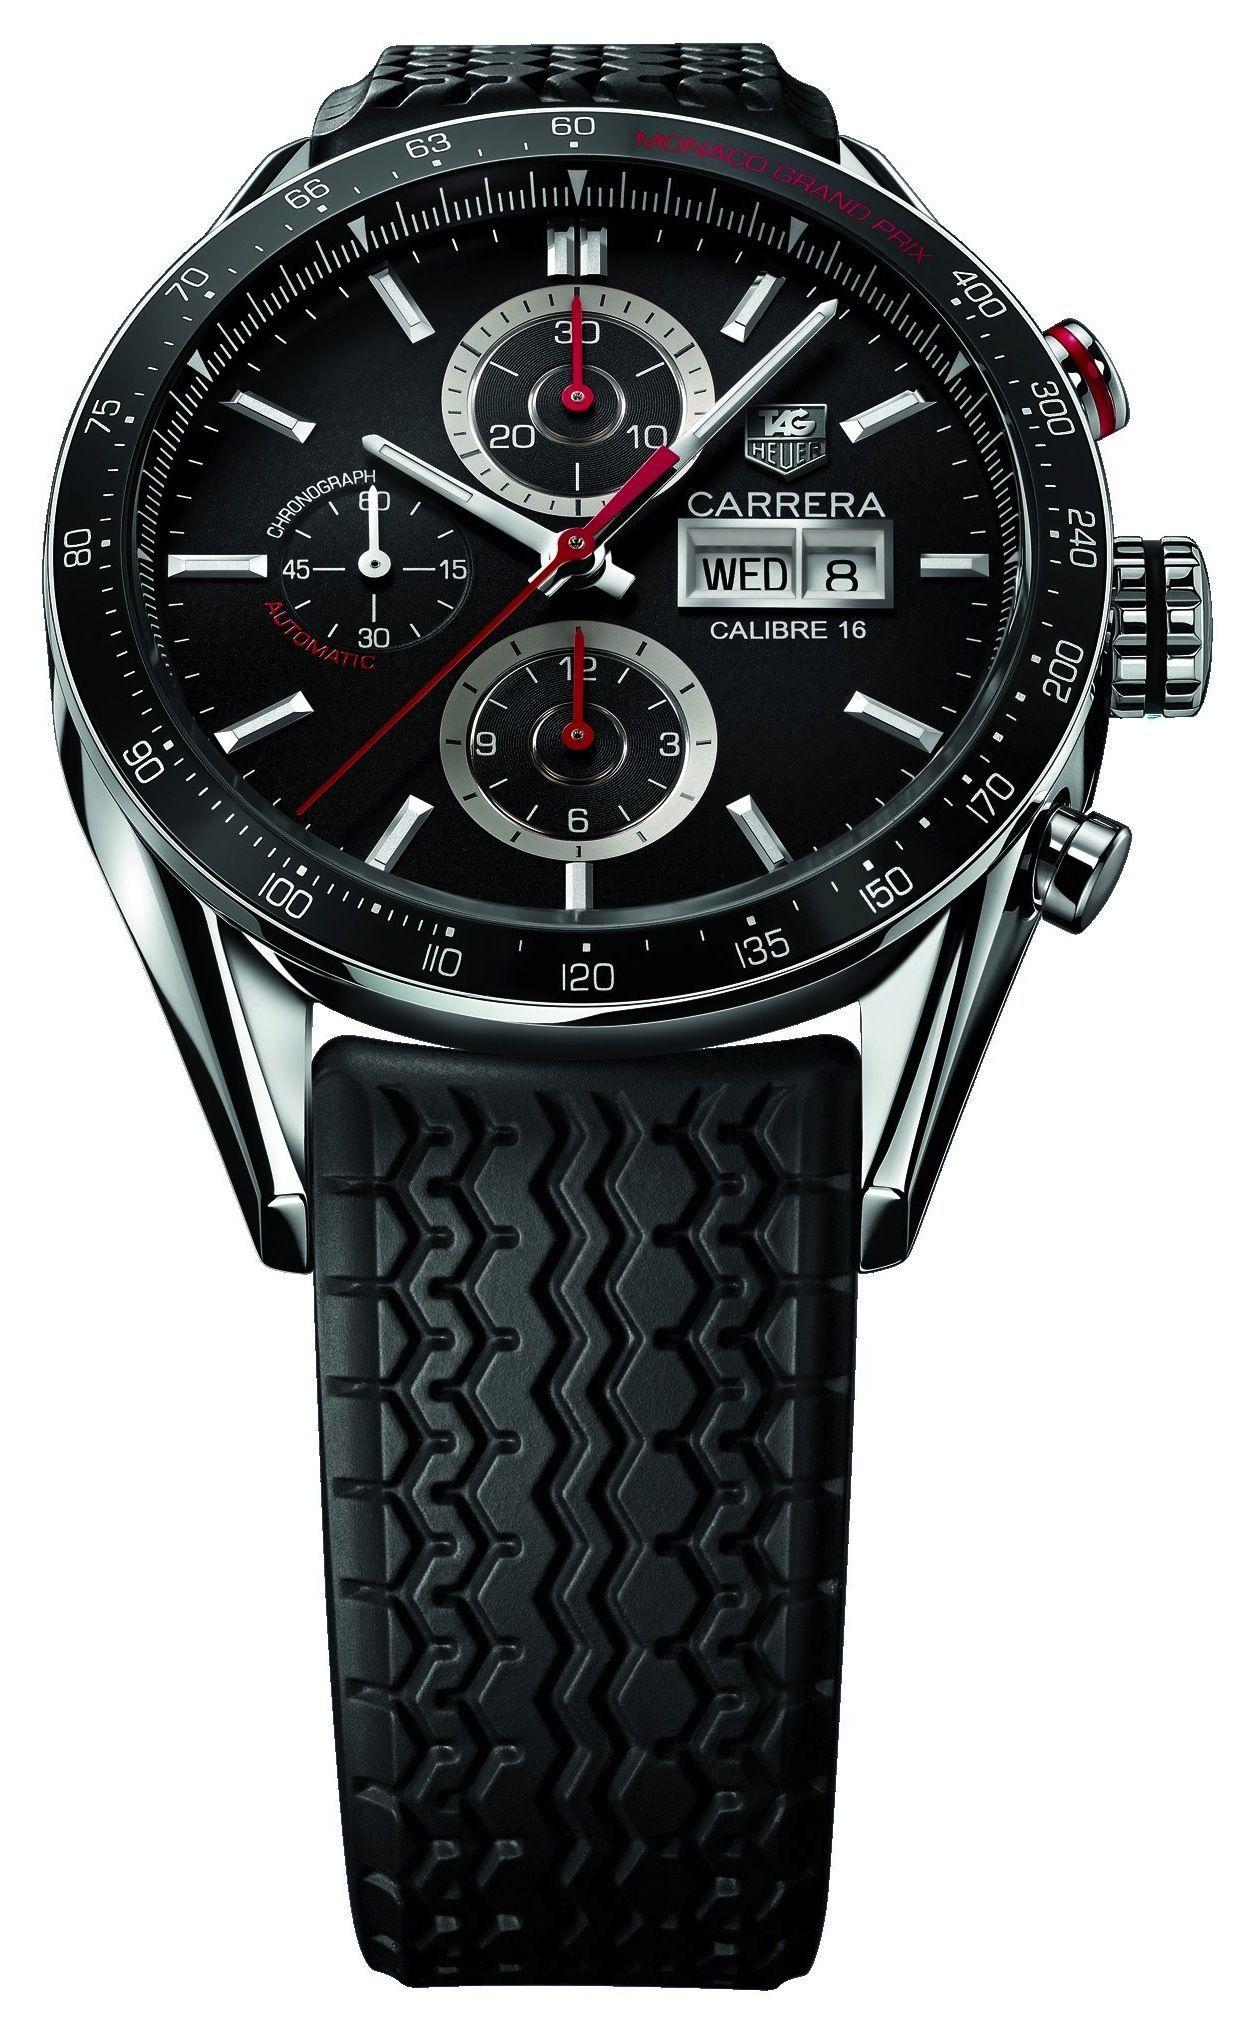 dfec3b95dbbea TAG Heuer Carrera, Monaco Grand Prix Watches limited edition   Tag ...